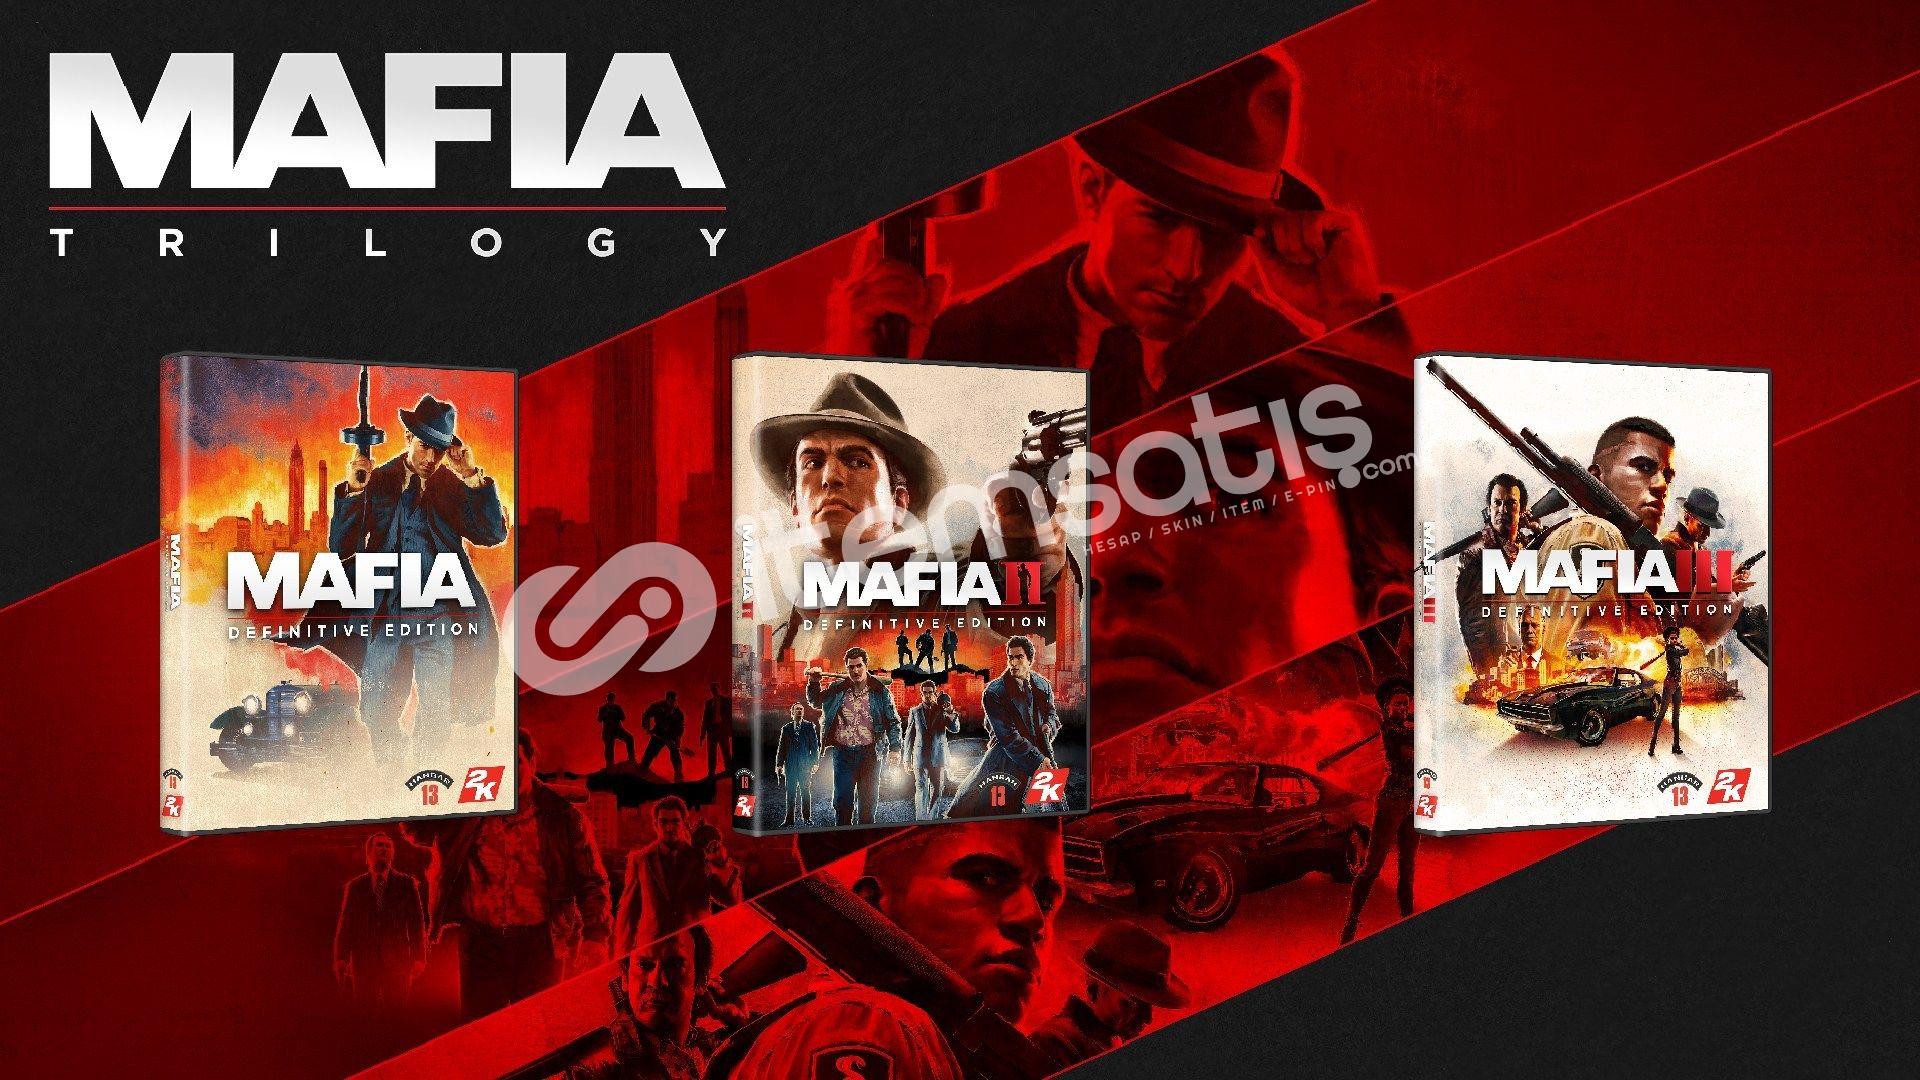 Mafia Trilogy + GARANTİ